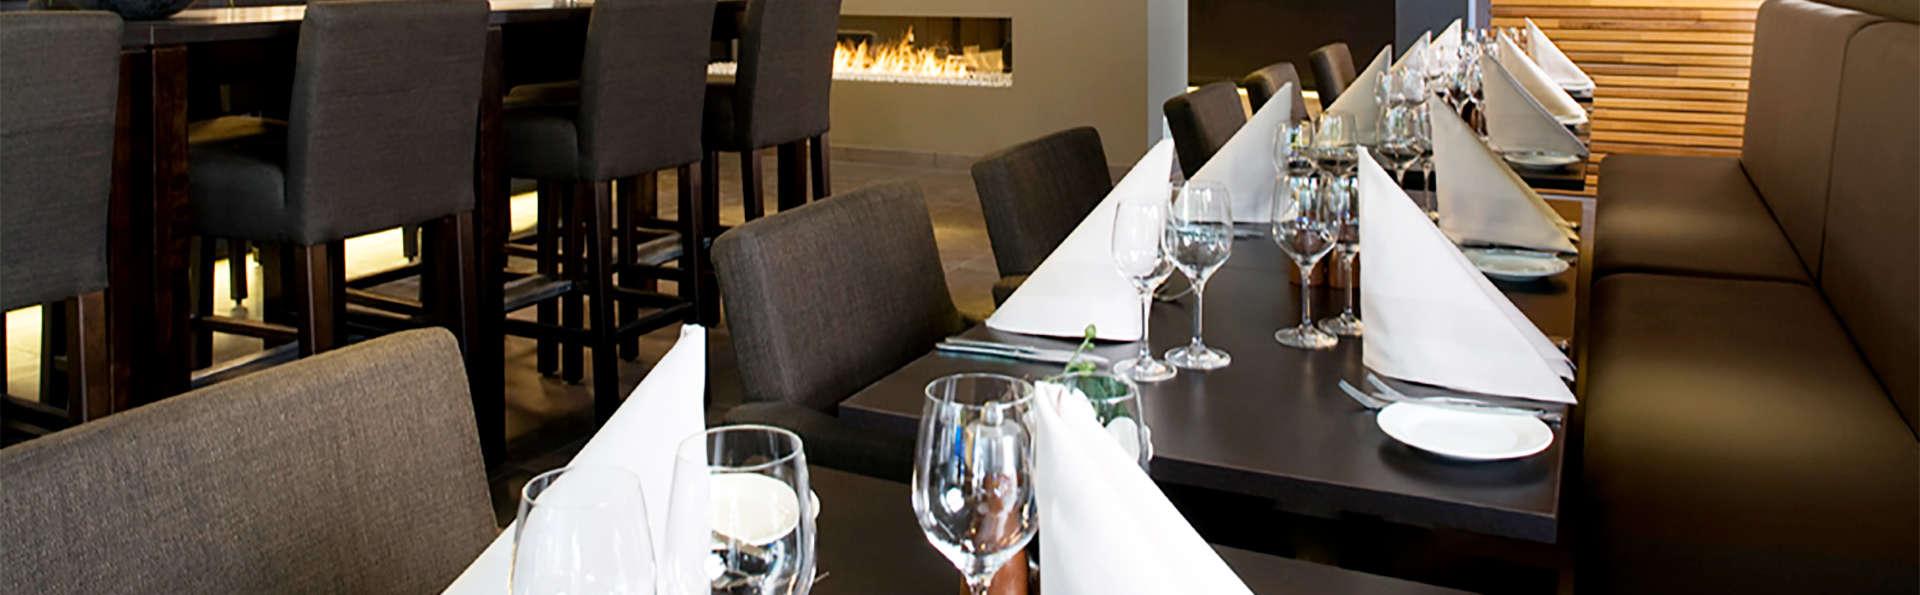 Diner, comfort en Brabantse charme